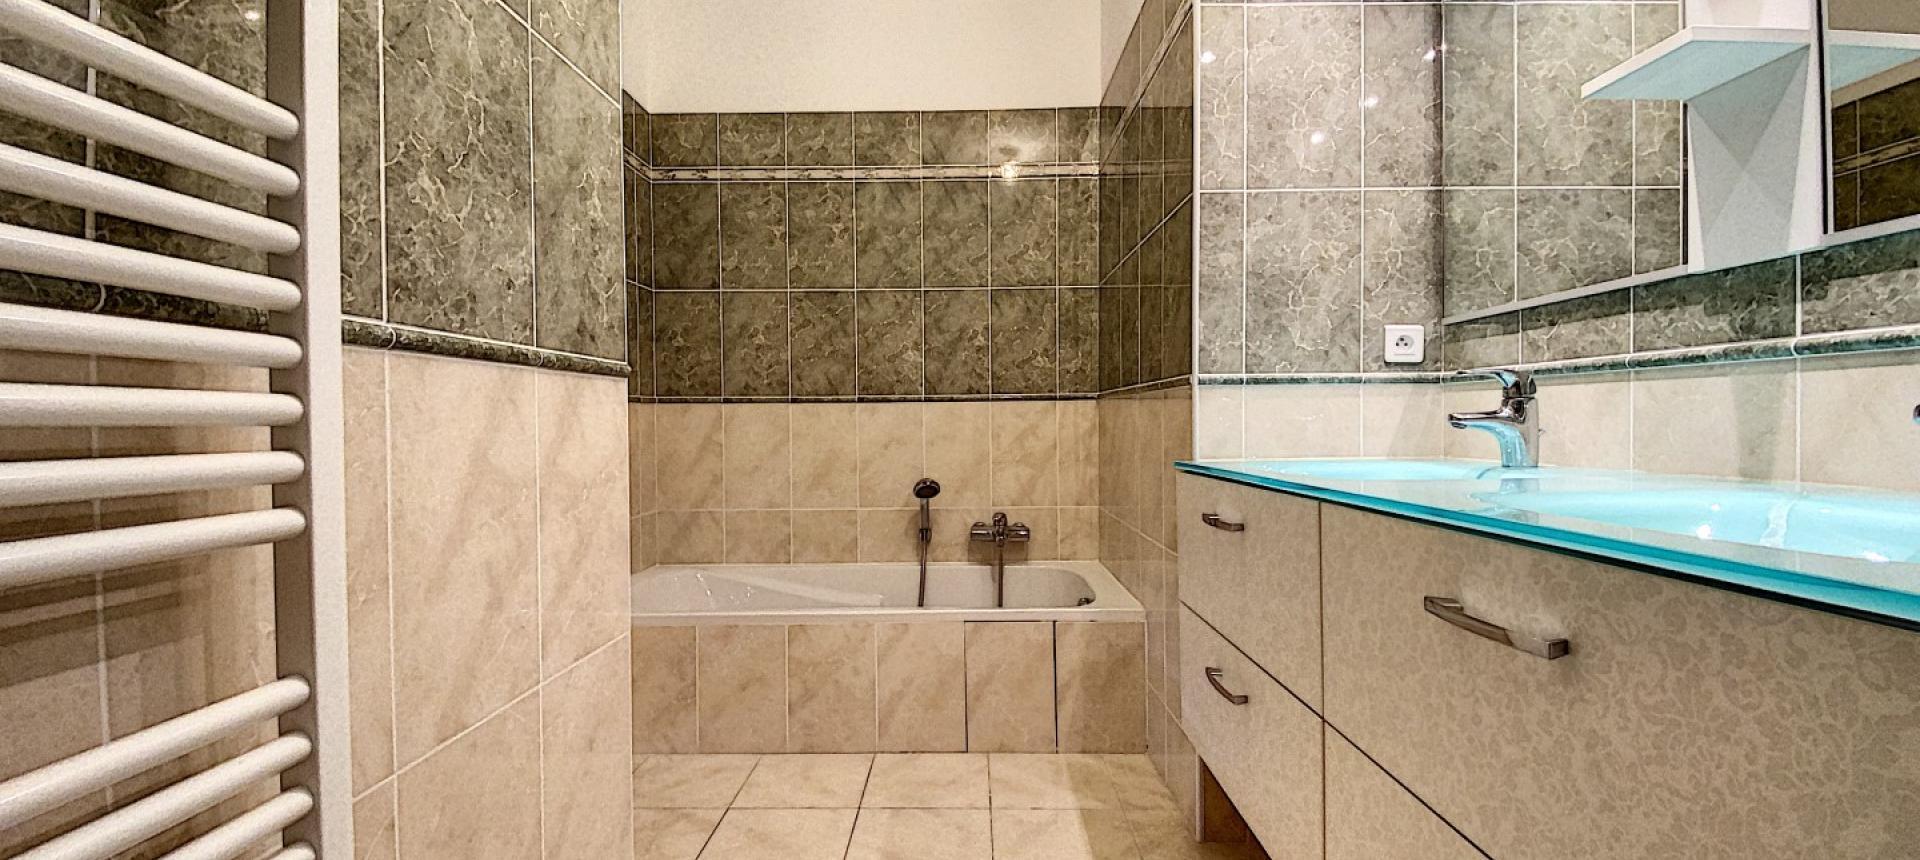 Salle de bain 2 F3 Cyclamens